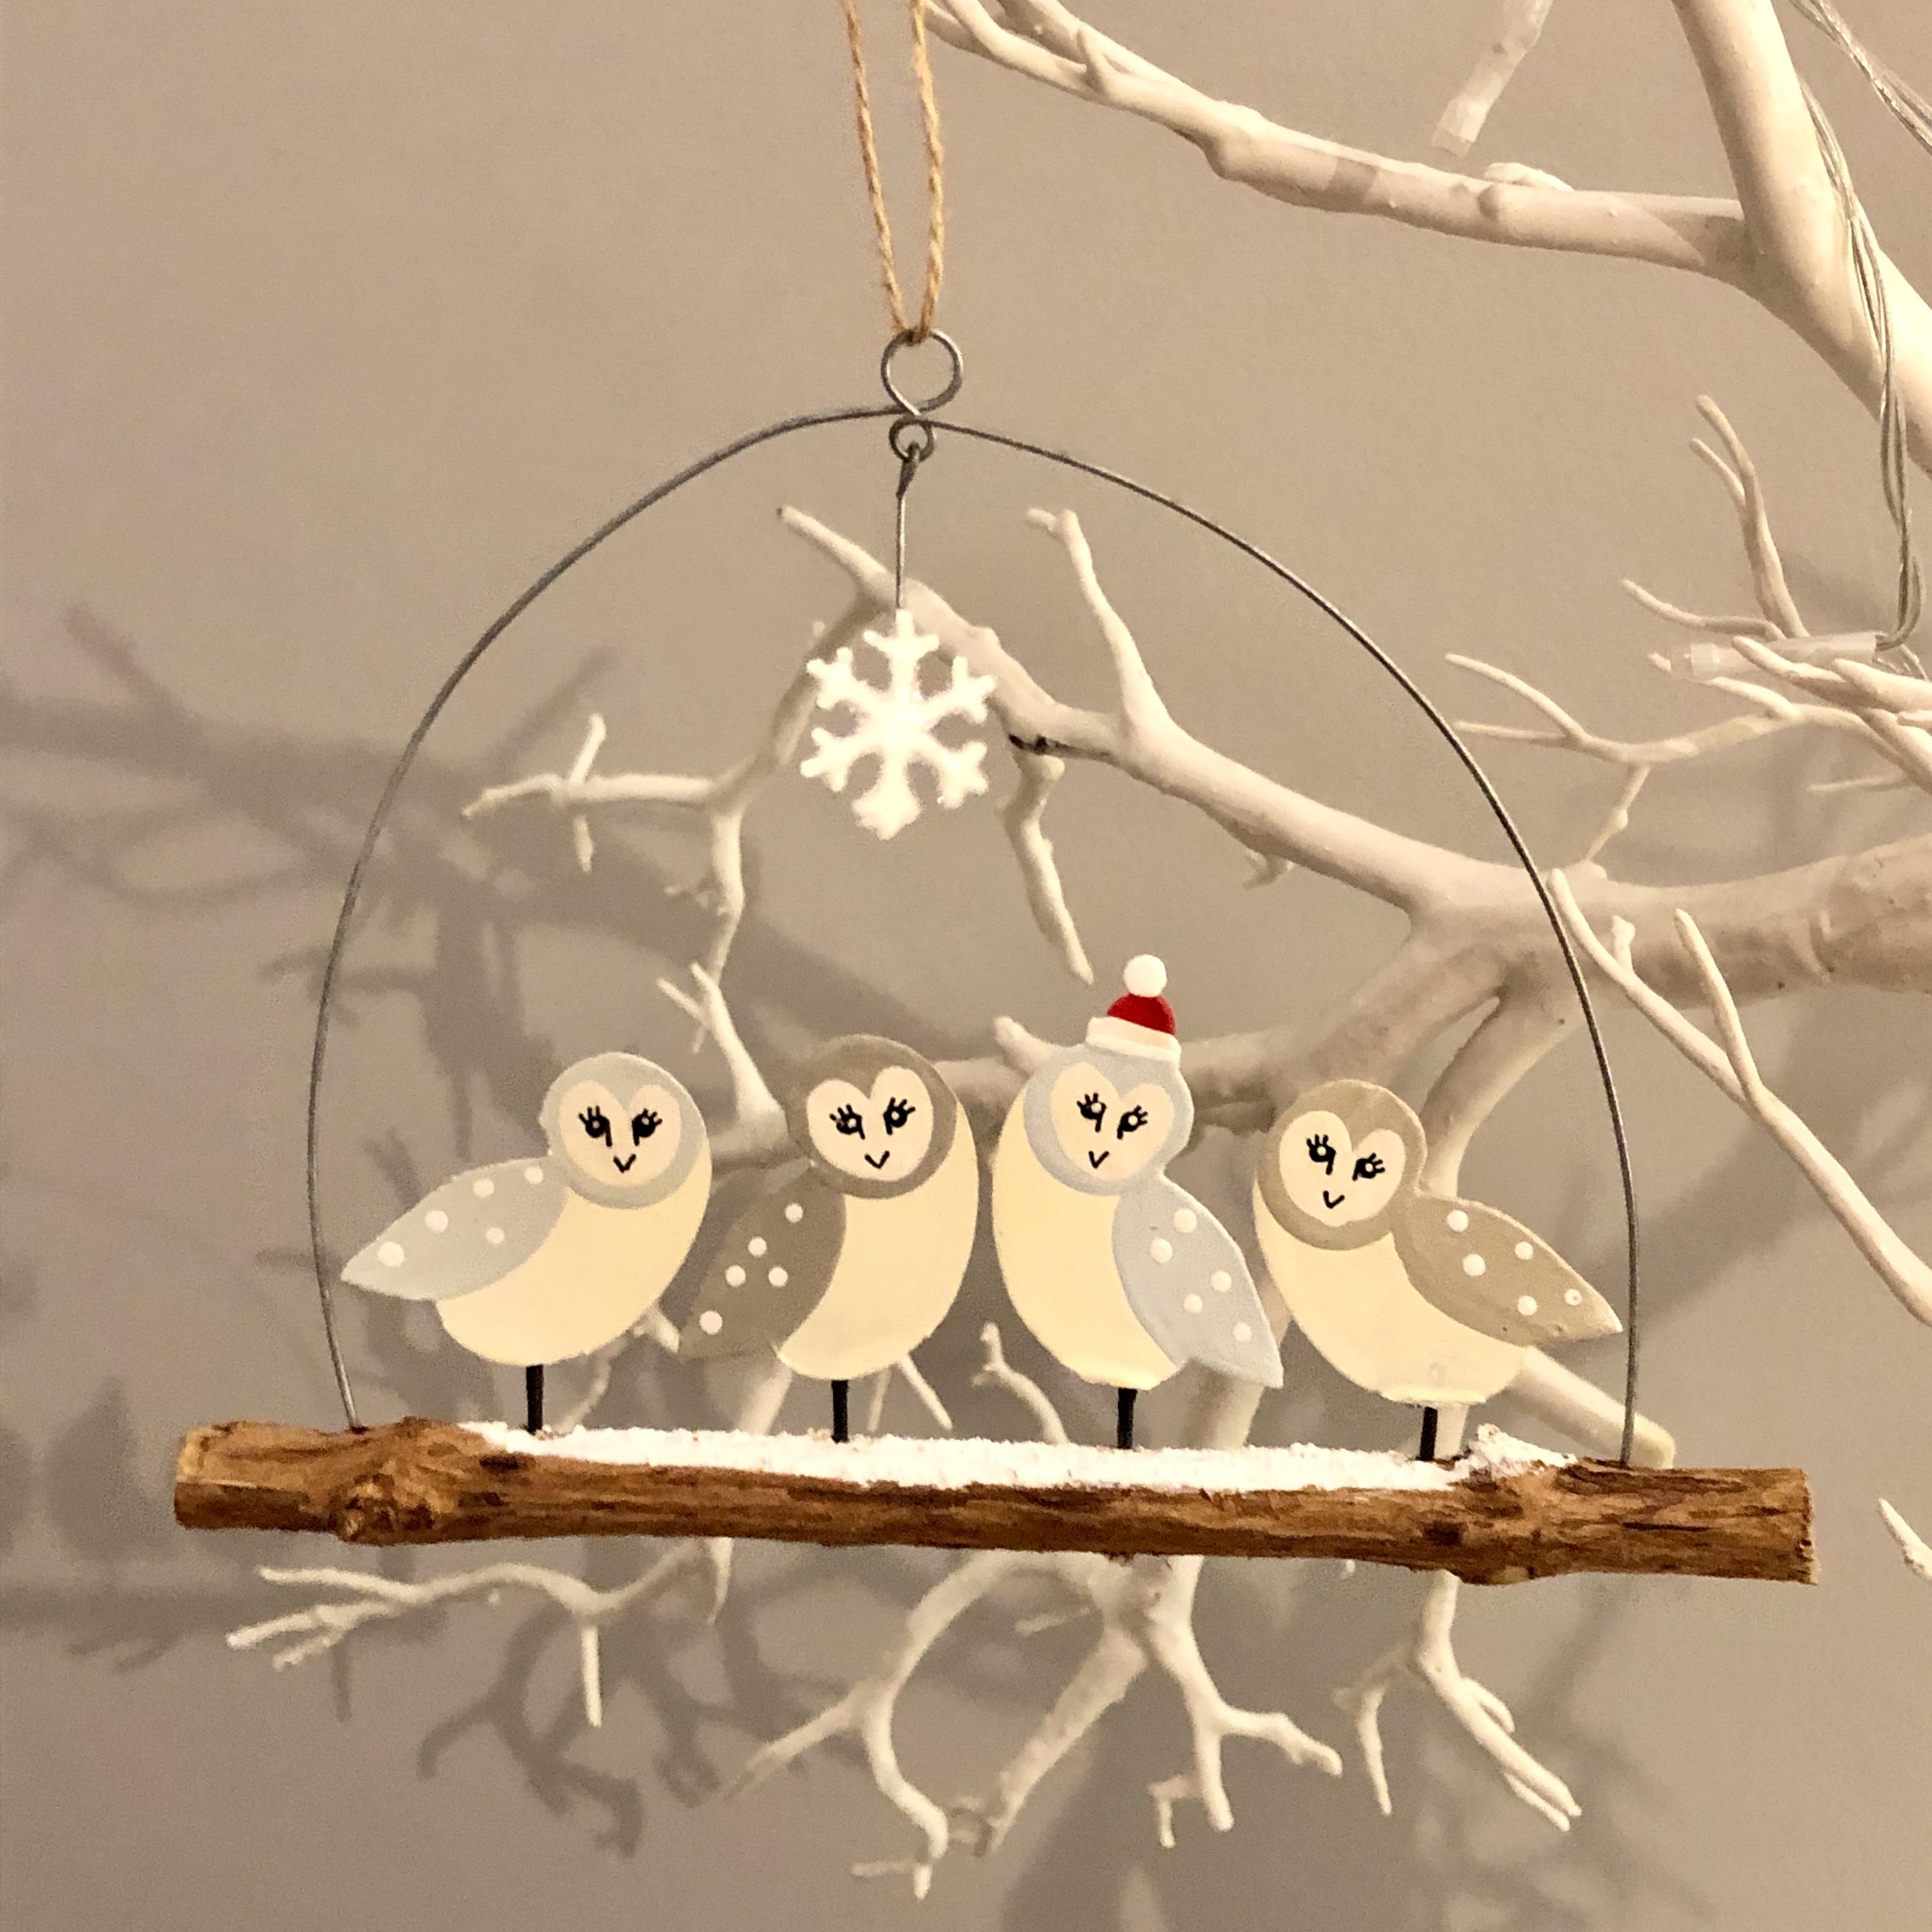 Barn owls on twig hanging decoration by shoeless joe